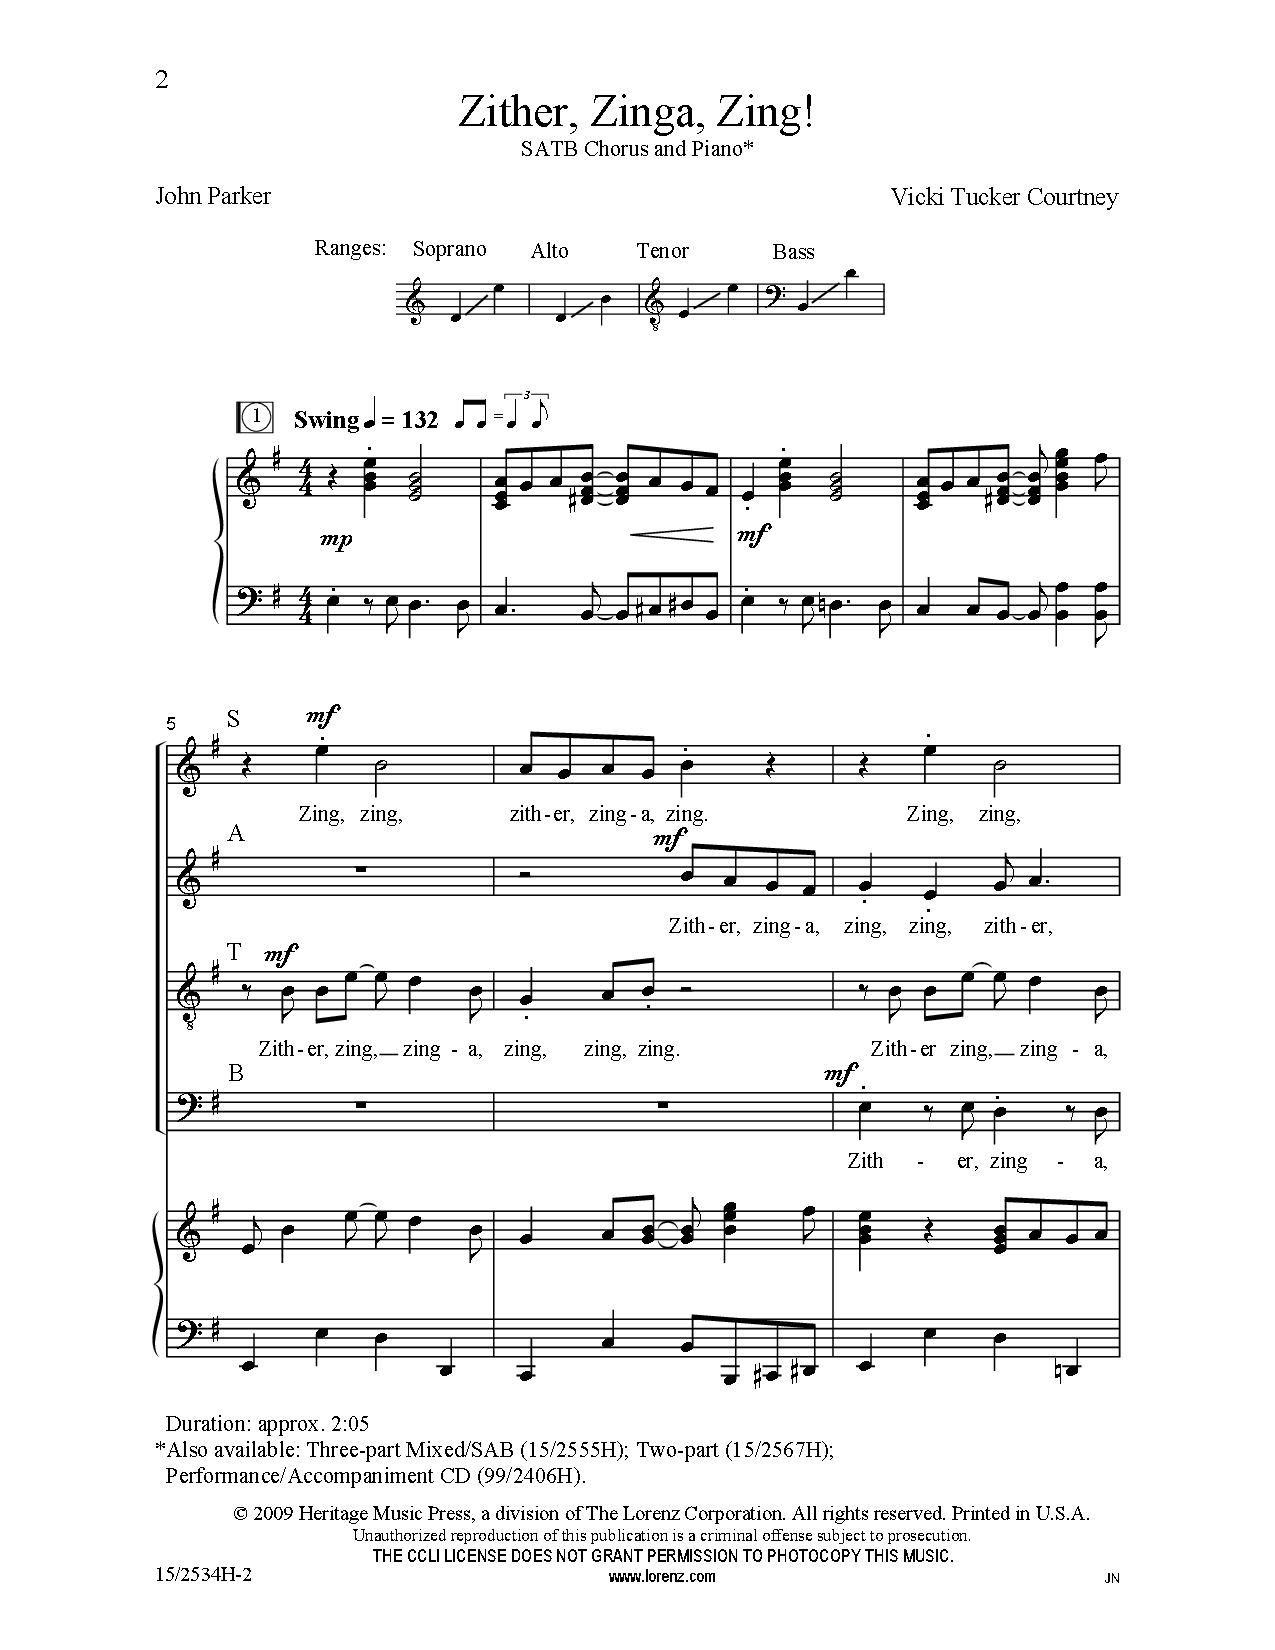 Zither Zinga Zing Satb By Vicki Tucker